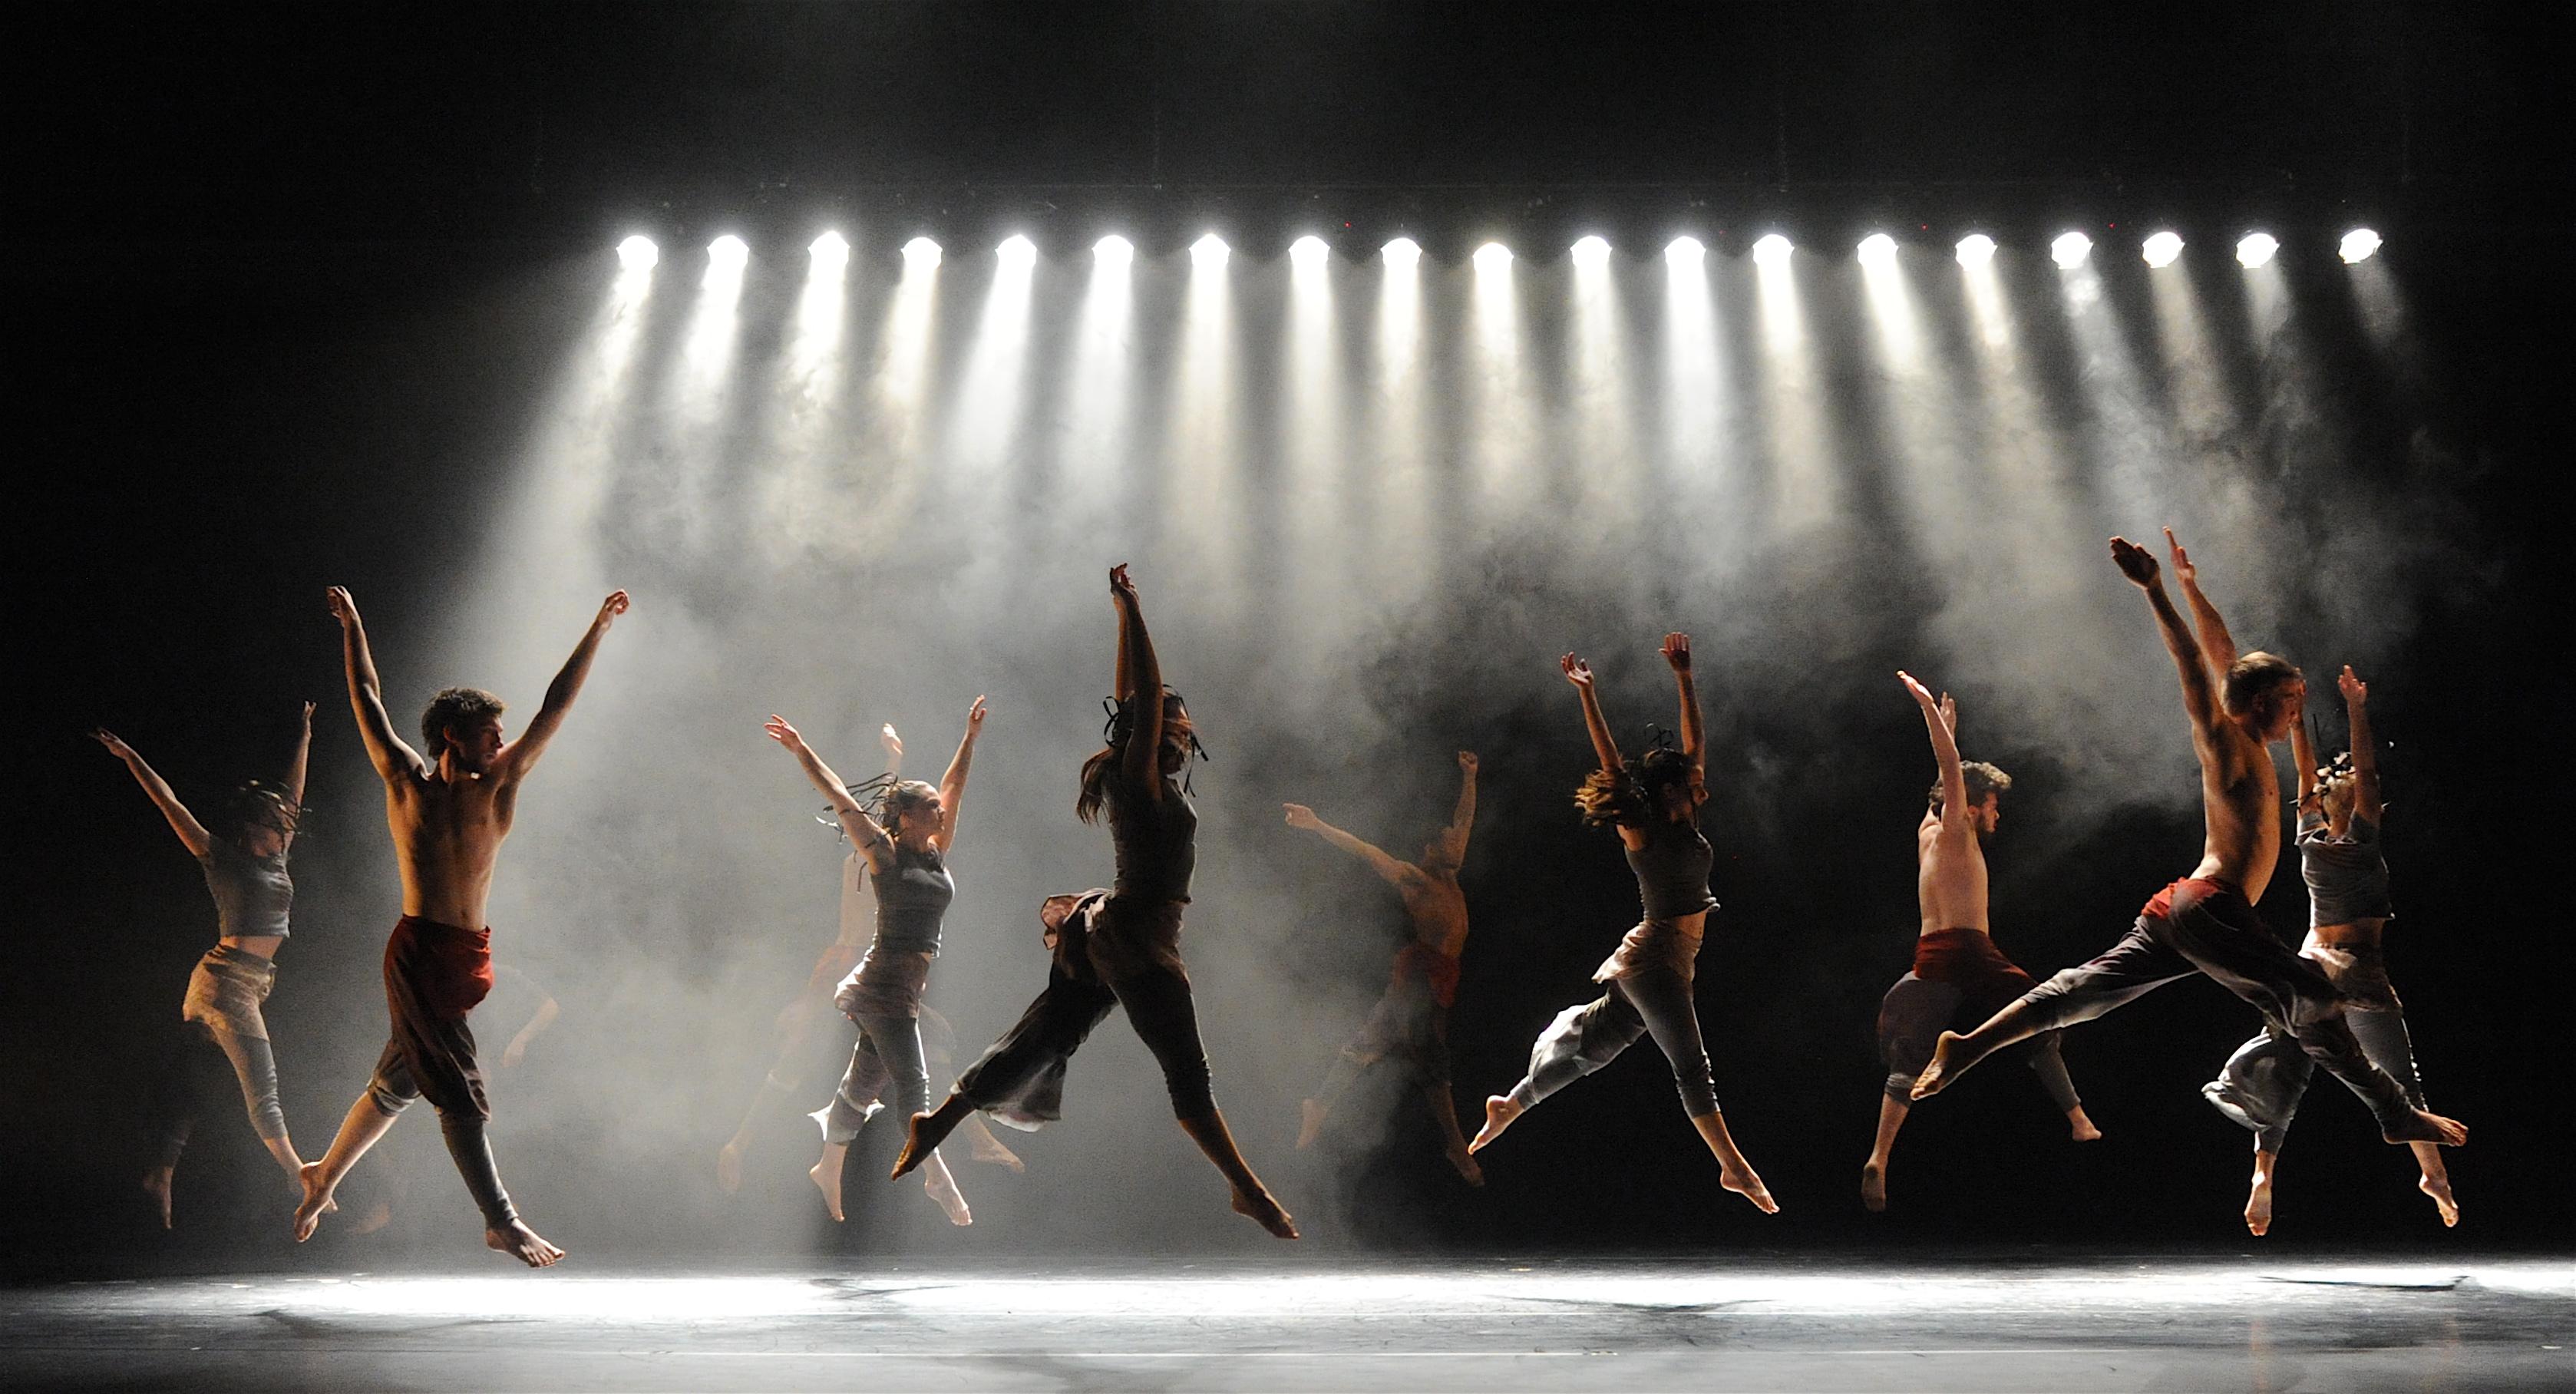 ballet dancers on stage - photo #27